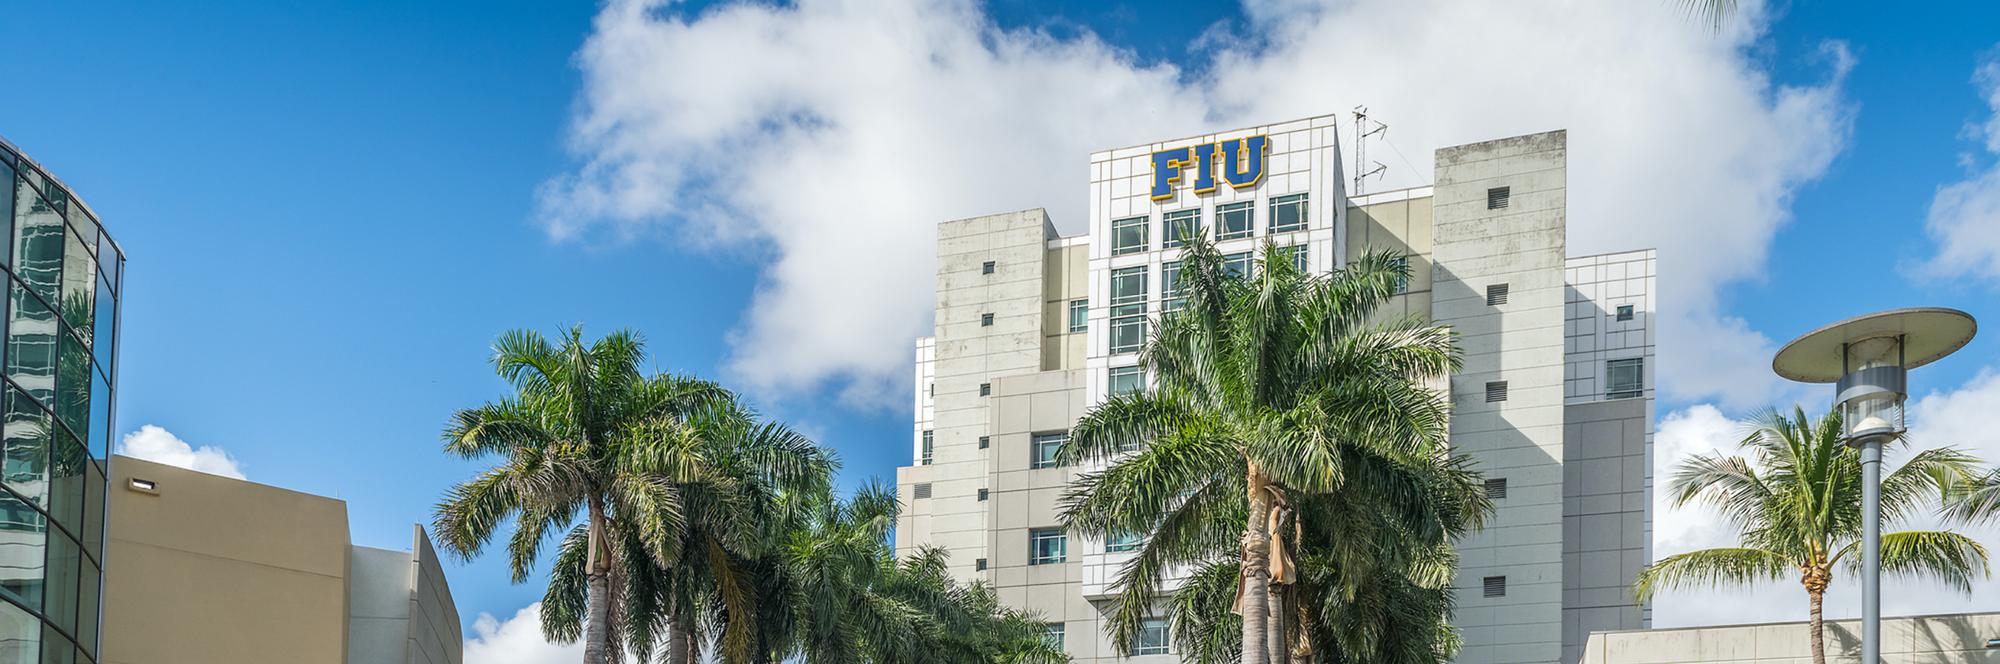 Florida International University Building